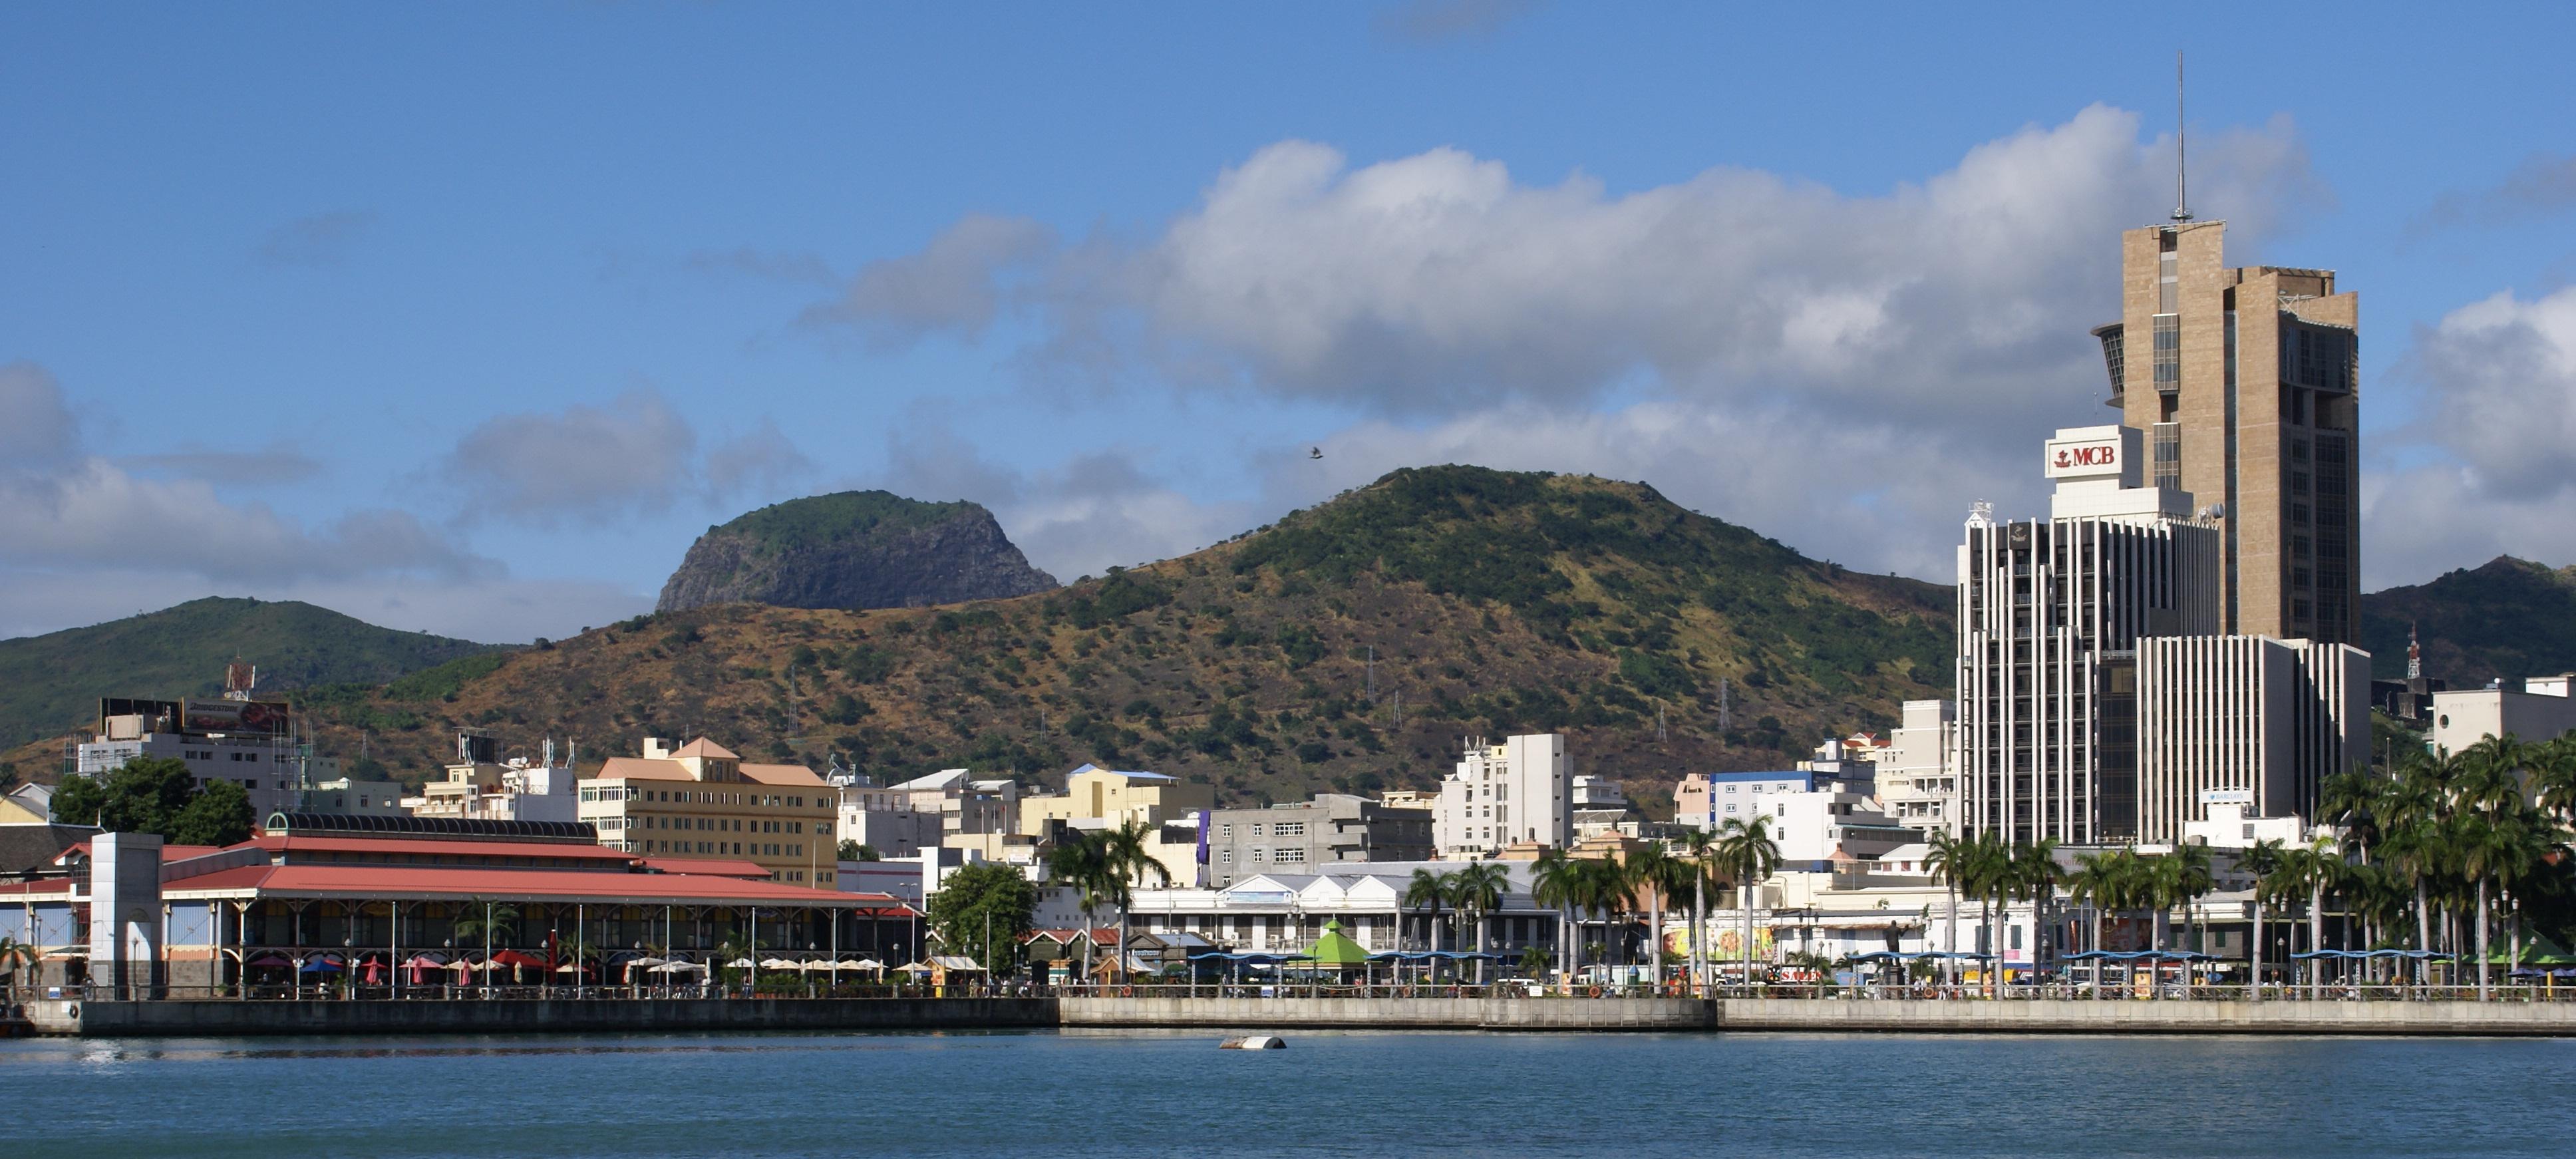 File mauritius port louis1 jpg wikimedia commons - Restaurant port louis ile maurice ...